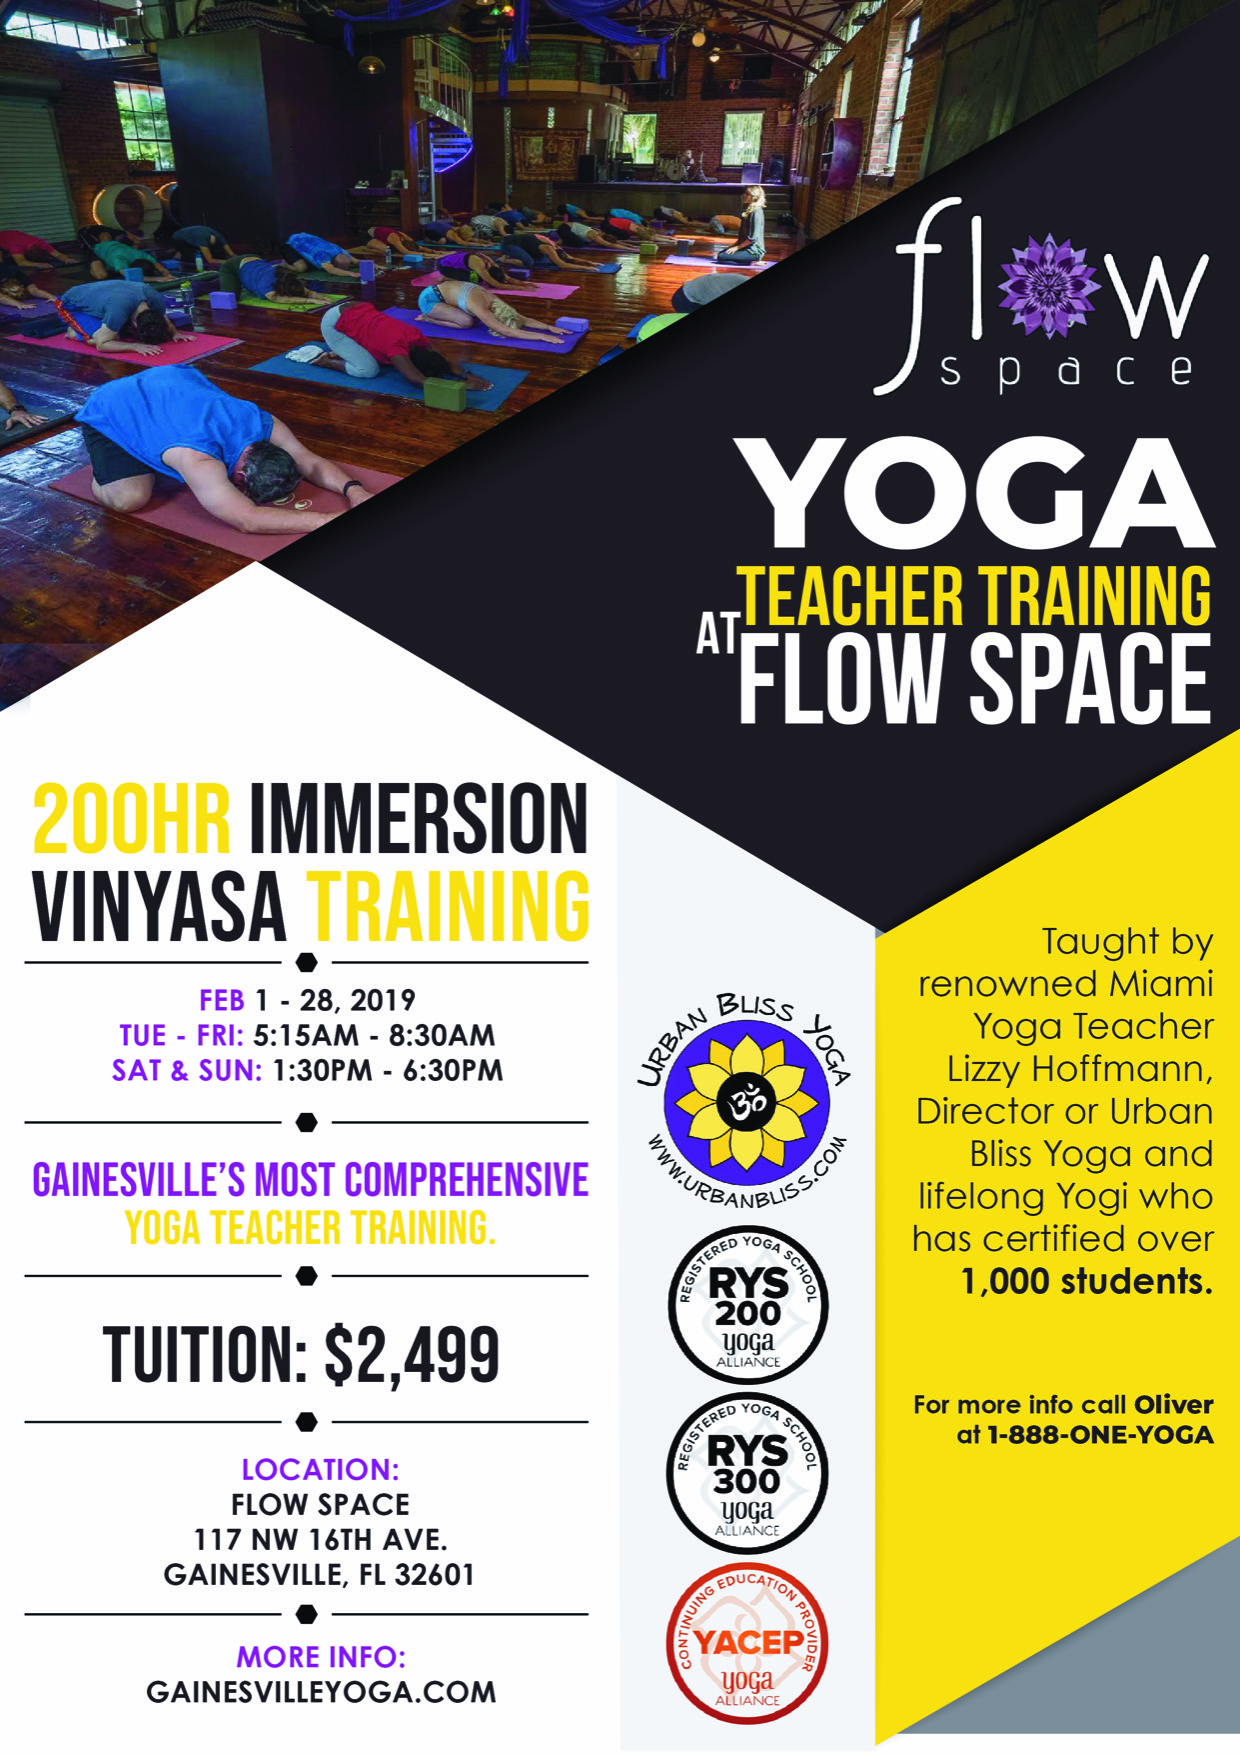 Yoga Alliance Gainesville Yoga Teacher Training